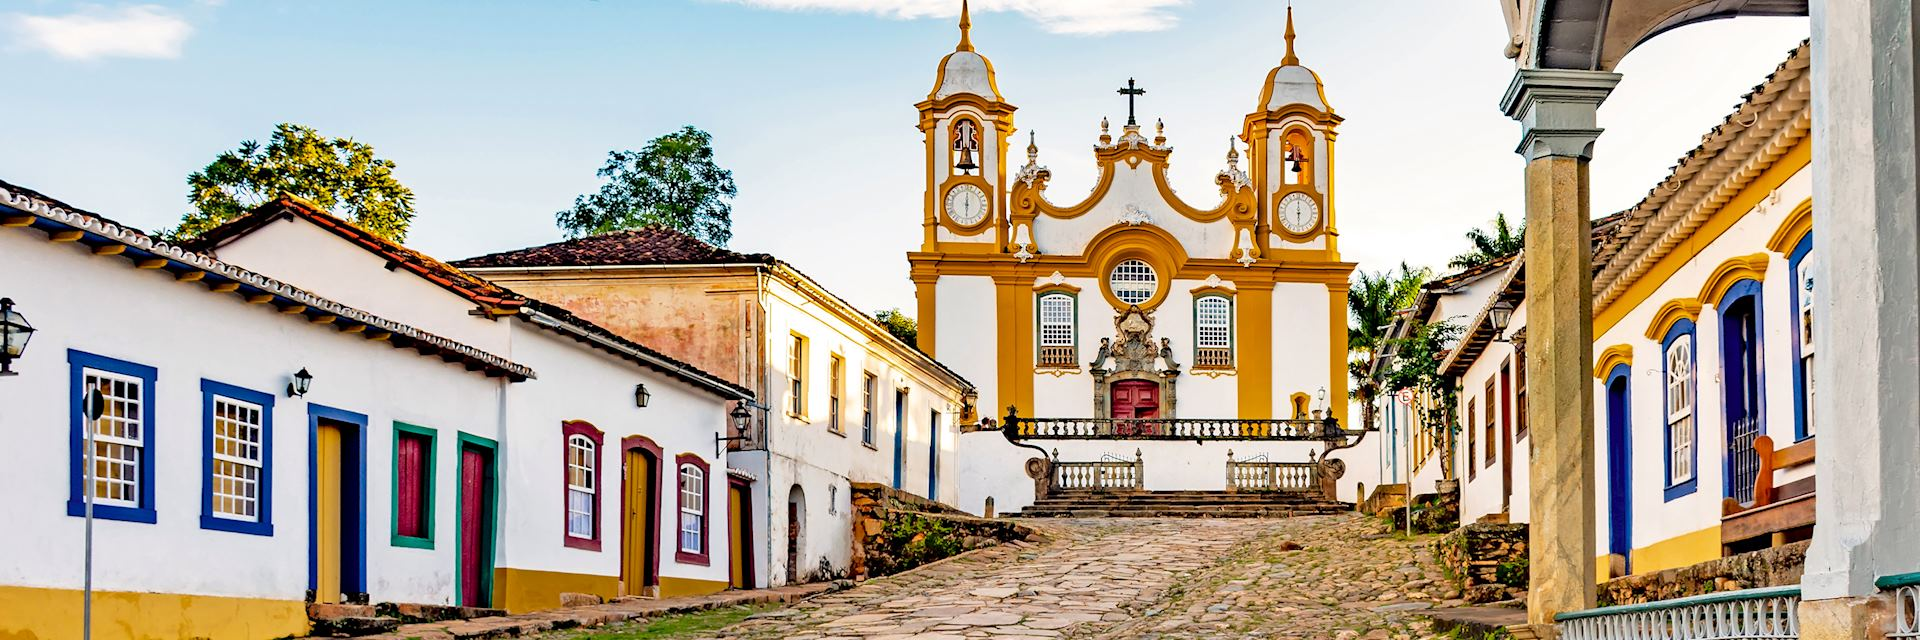 Church in Tiradentes